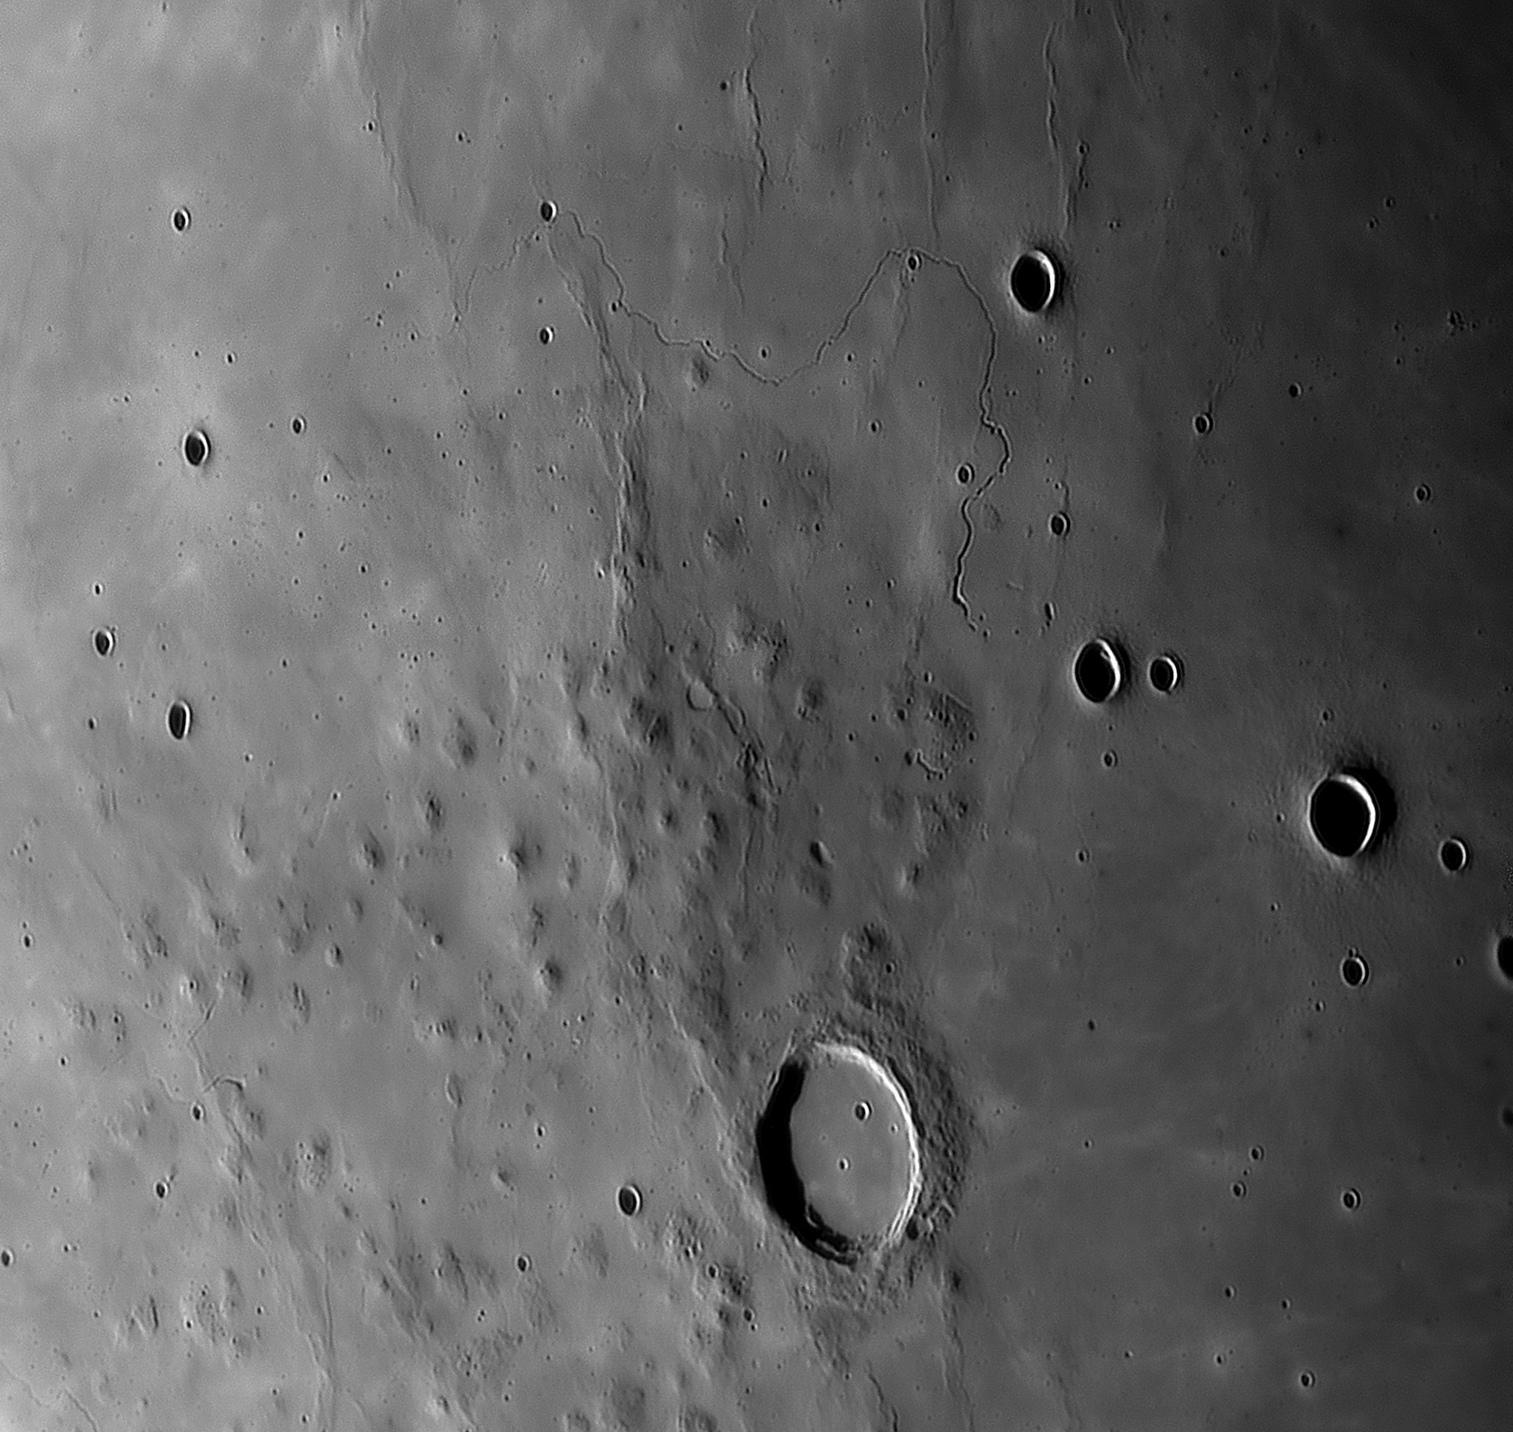 large.moon_26_08_2019_Marius_Red8.jpg.4e6b7a1124d06426740f92e443c7cd12.jpg